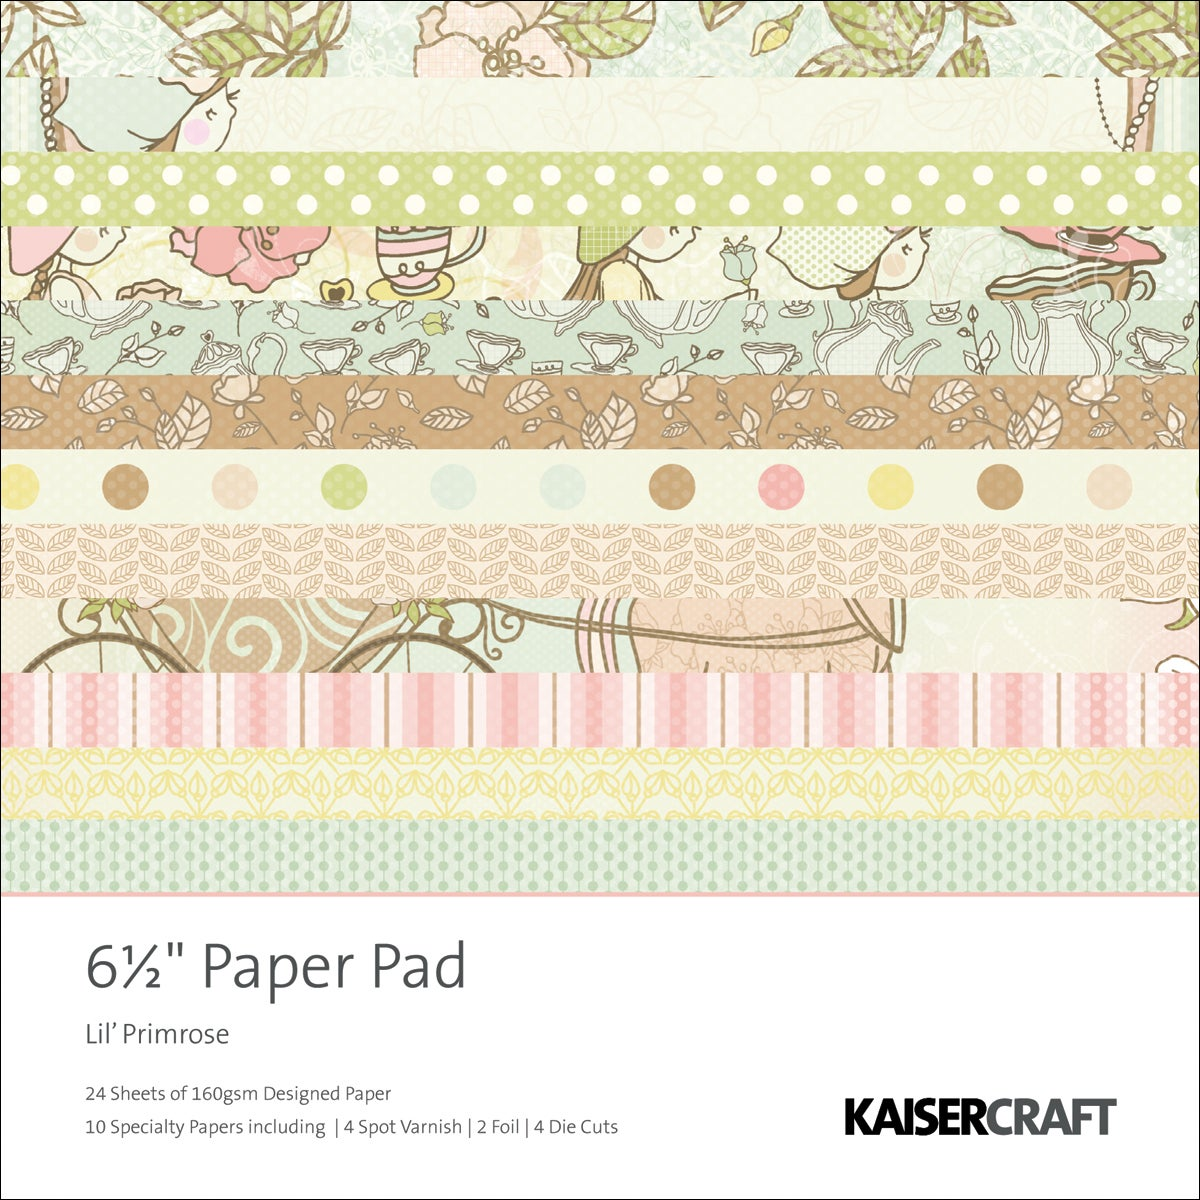 Kaisercraft 'Lil' Primrose' Paper Pad